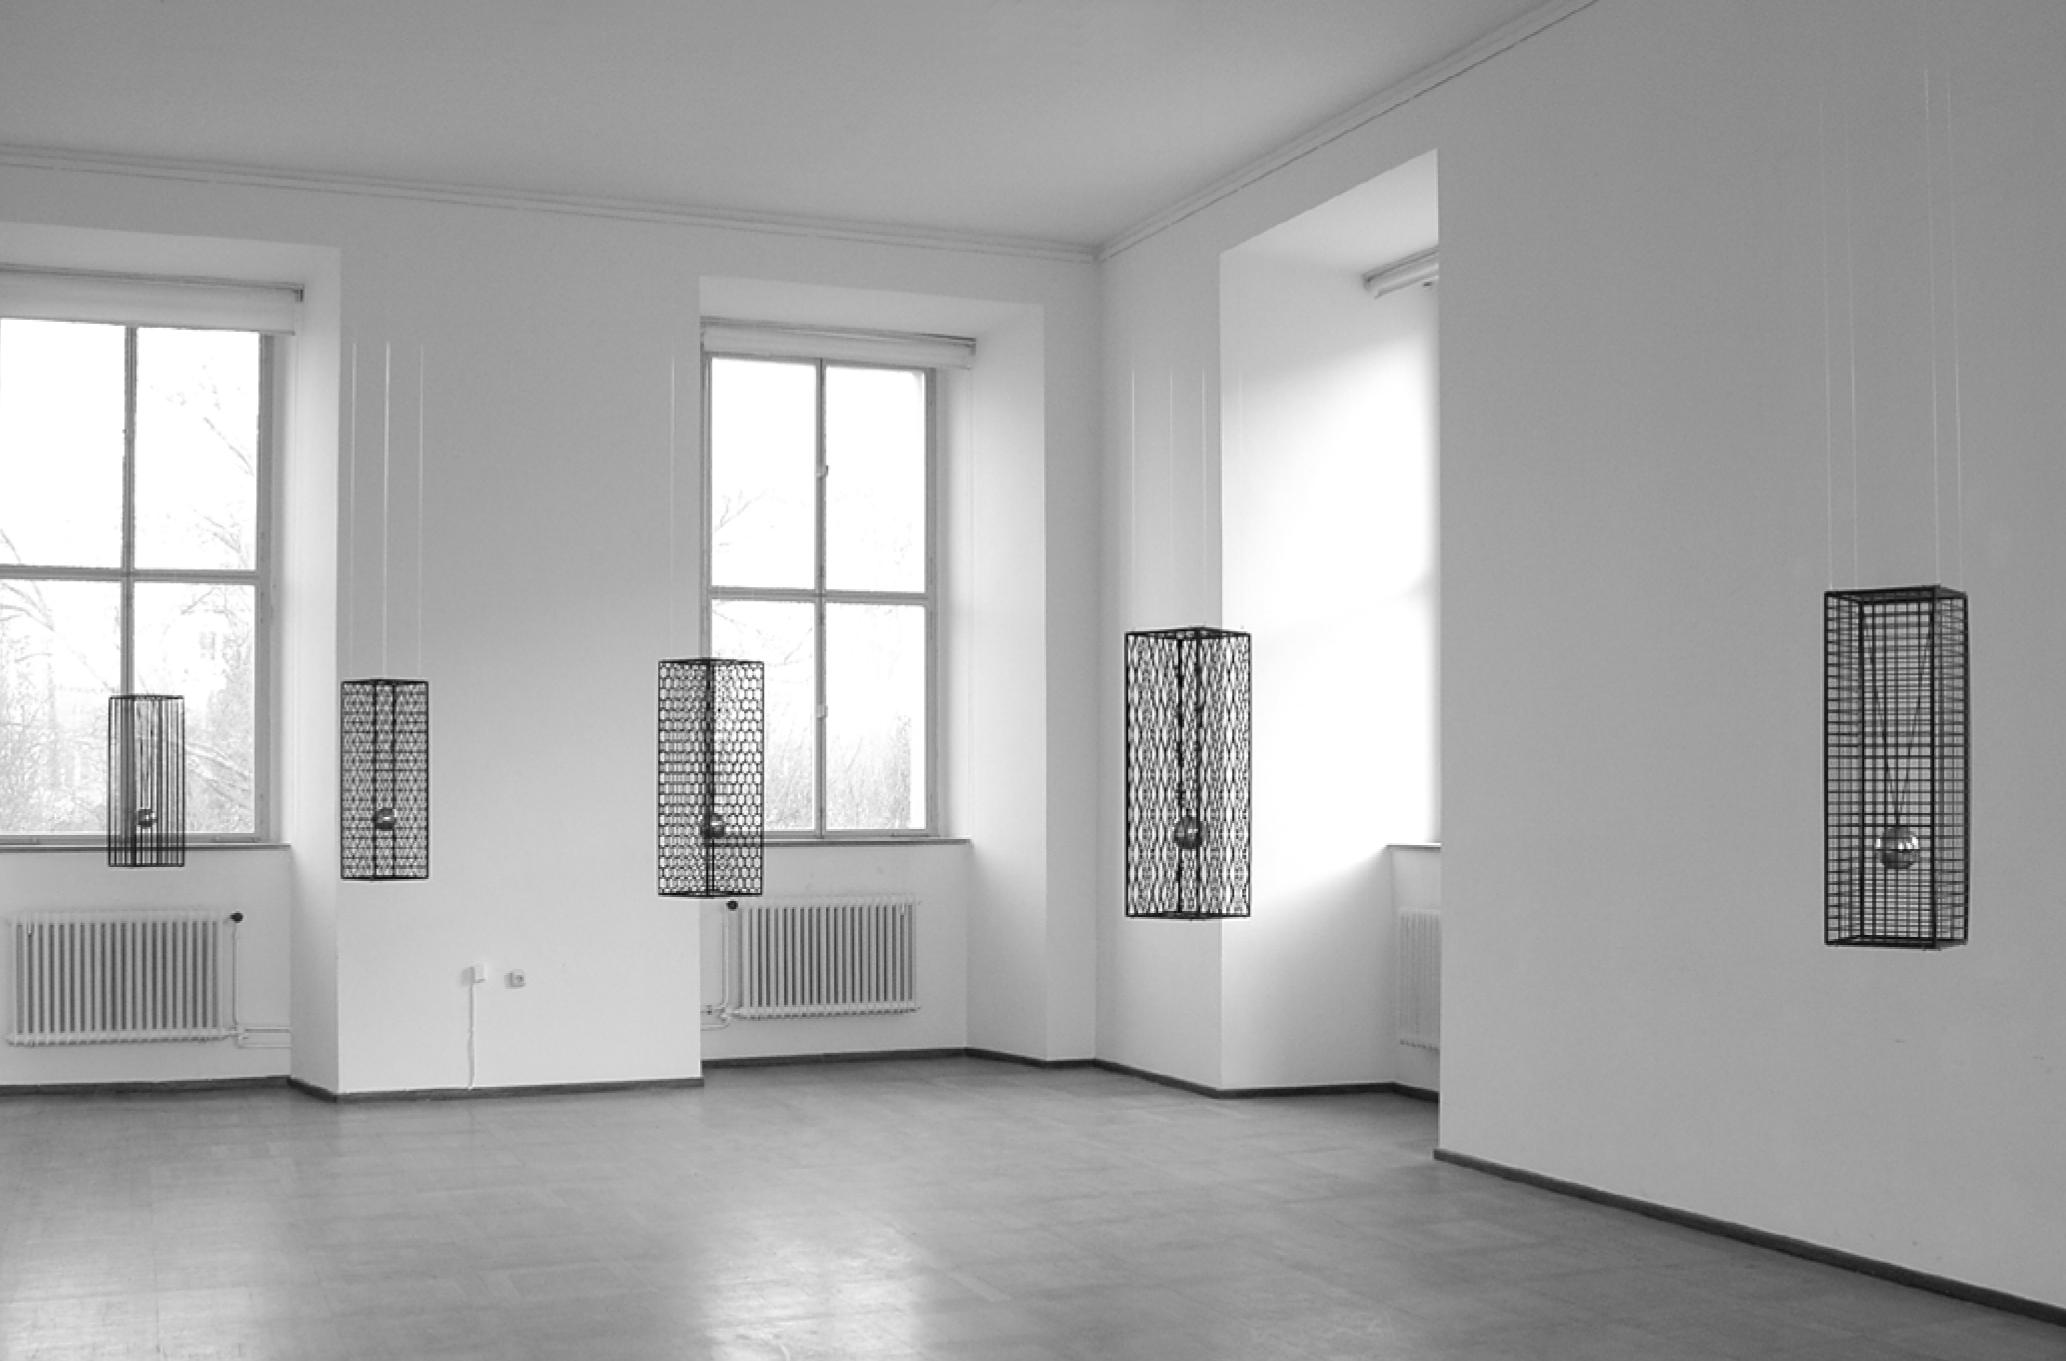 Jiro Kamata, Extrovert, halssieraden, 2006, tentoonstelling